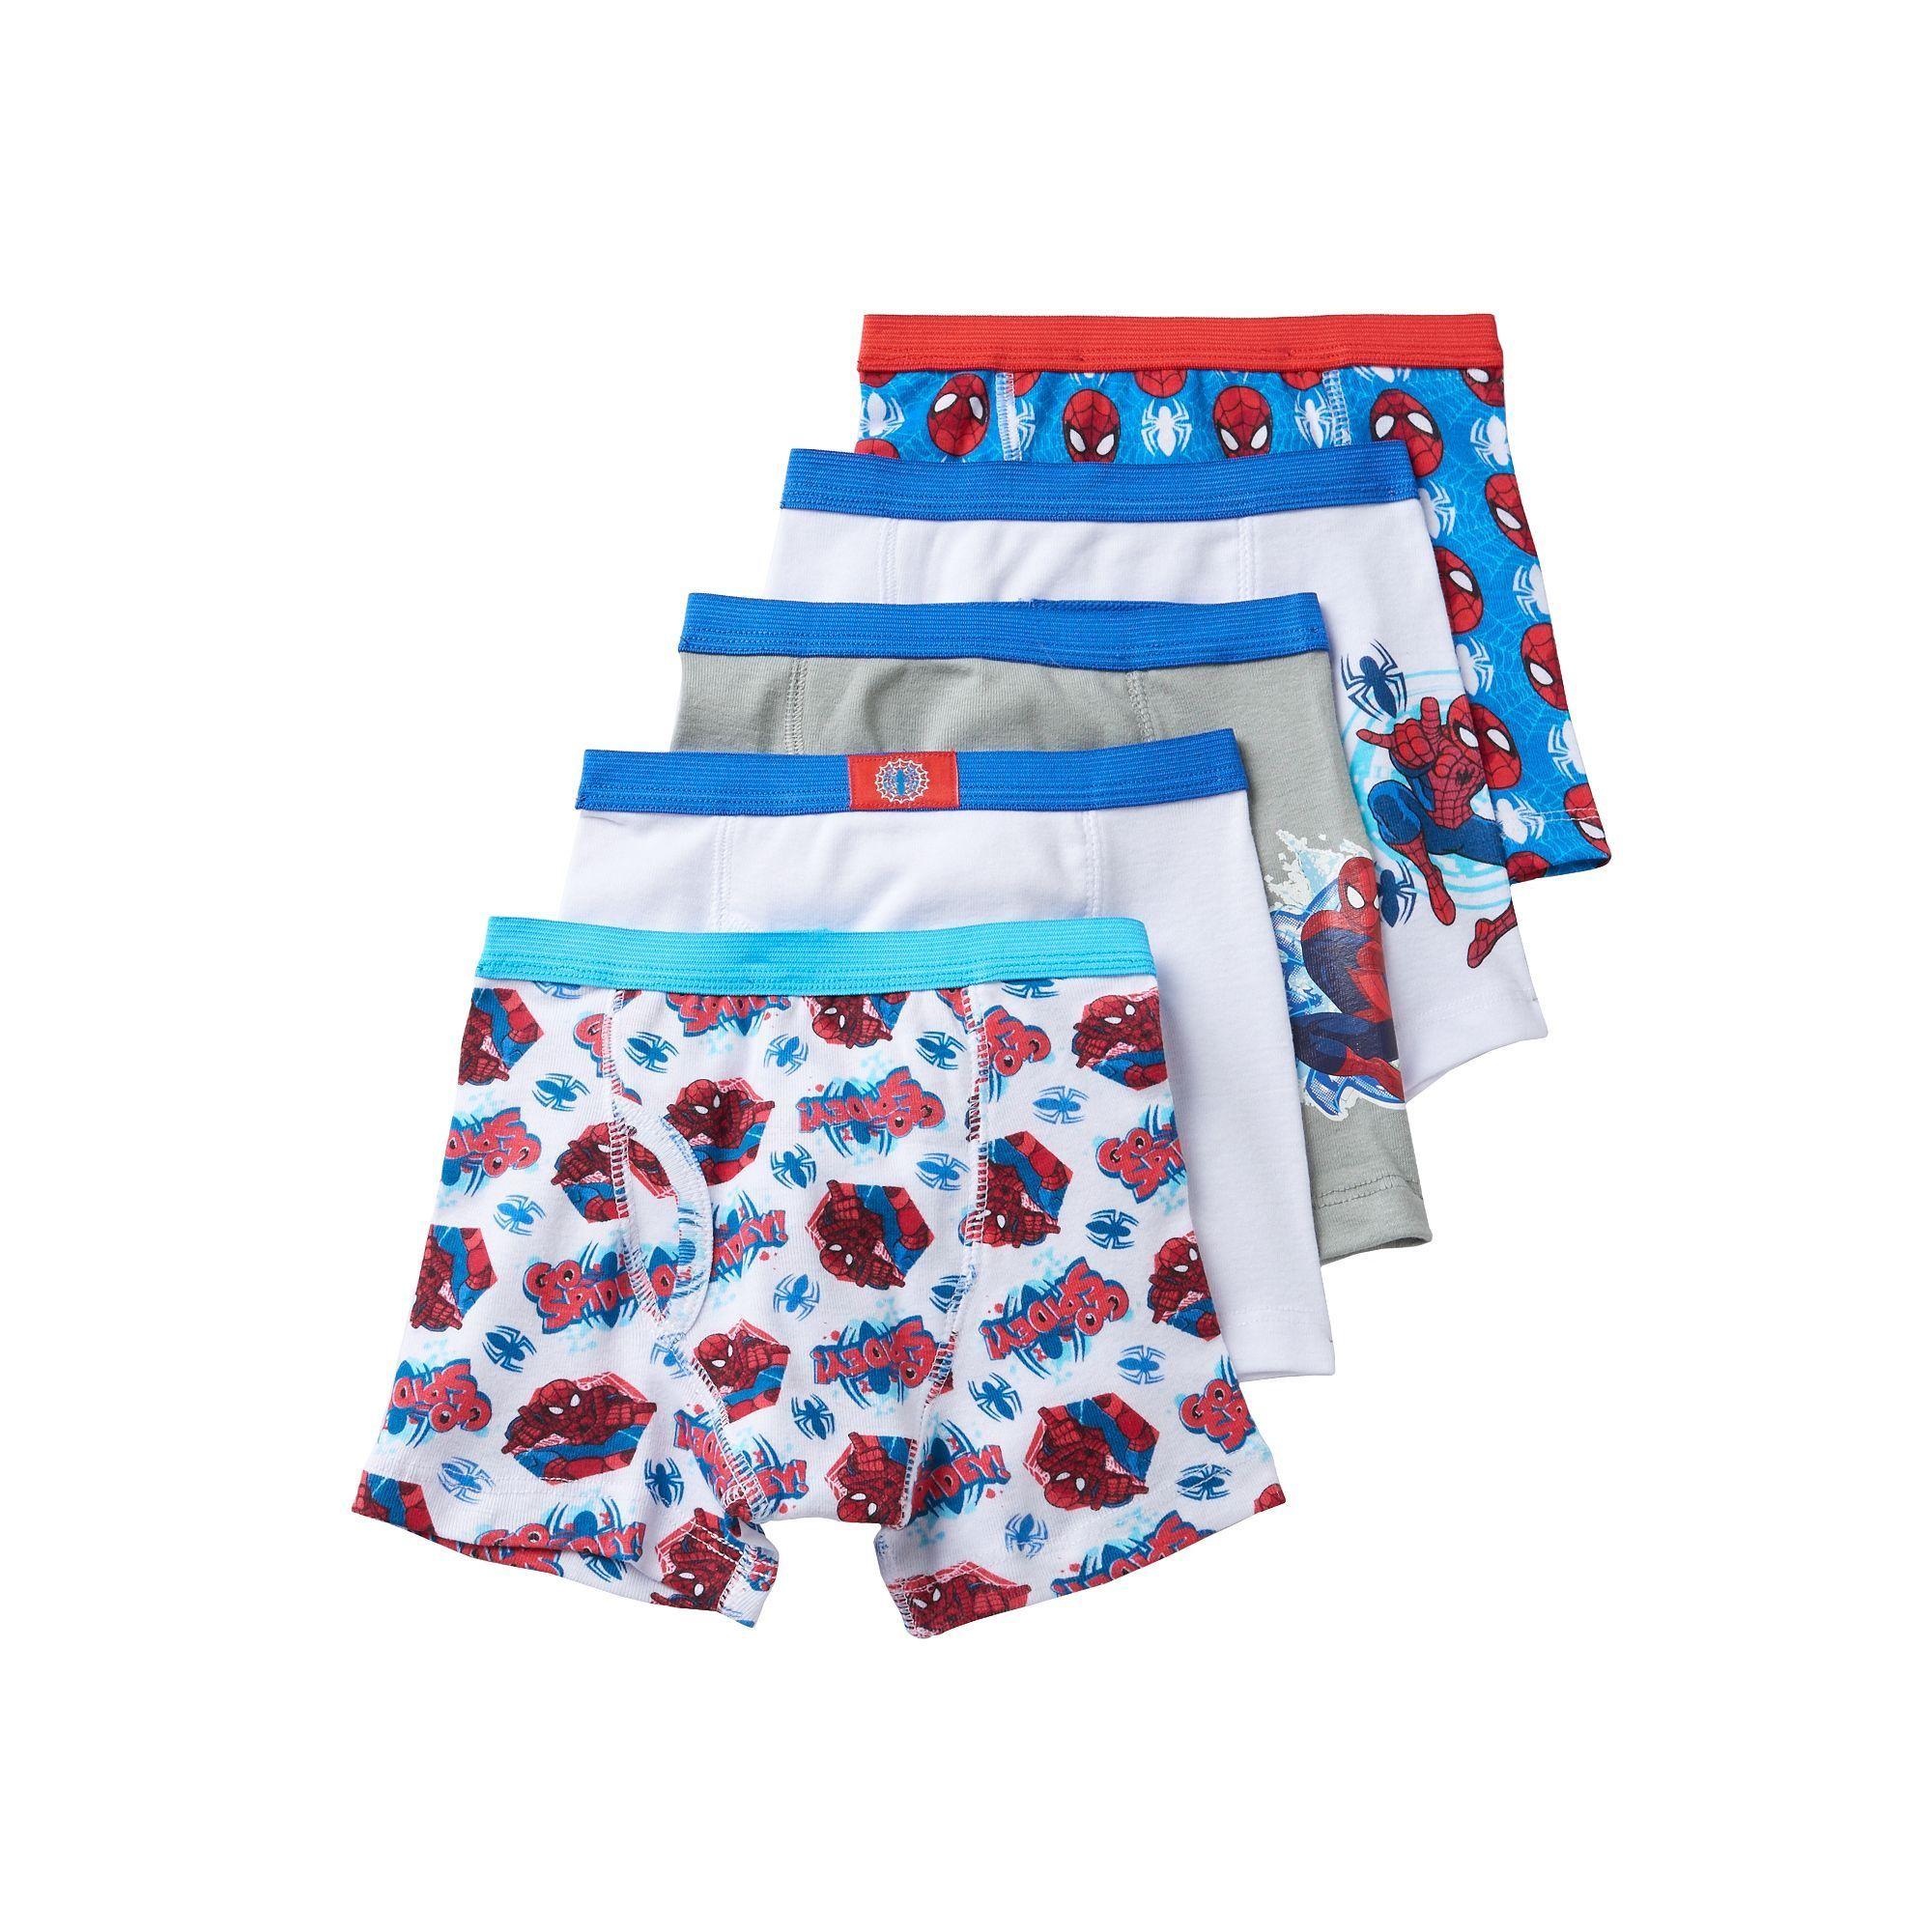 M/&S Kids Star wars Boxer Shorts